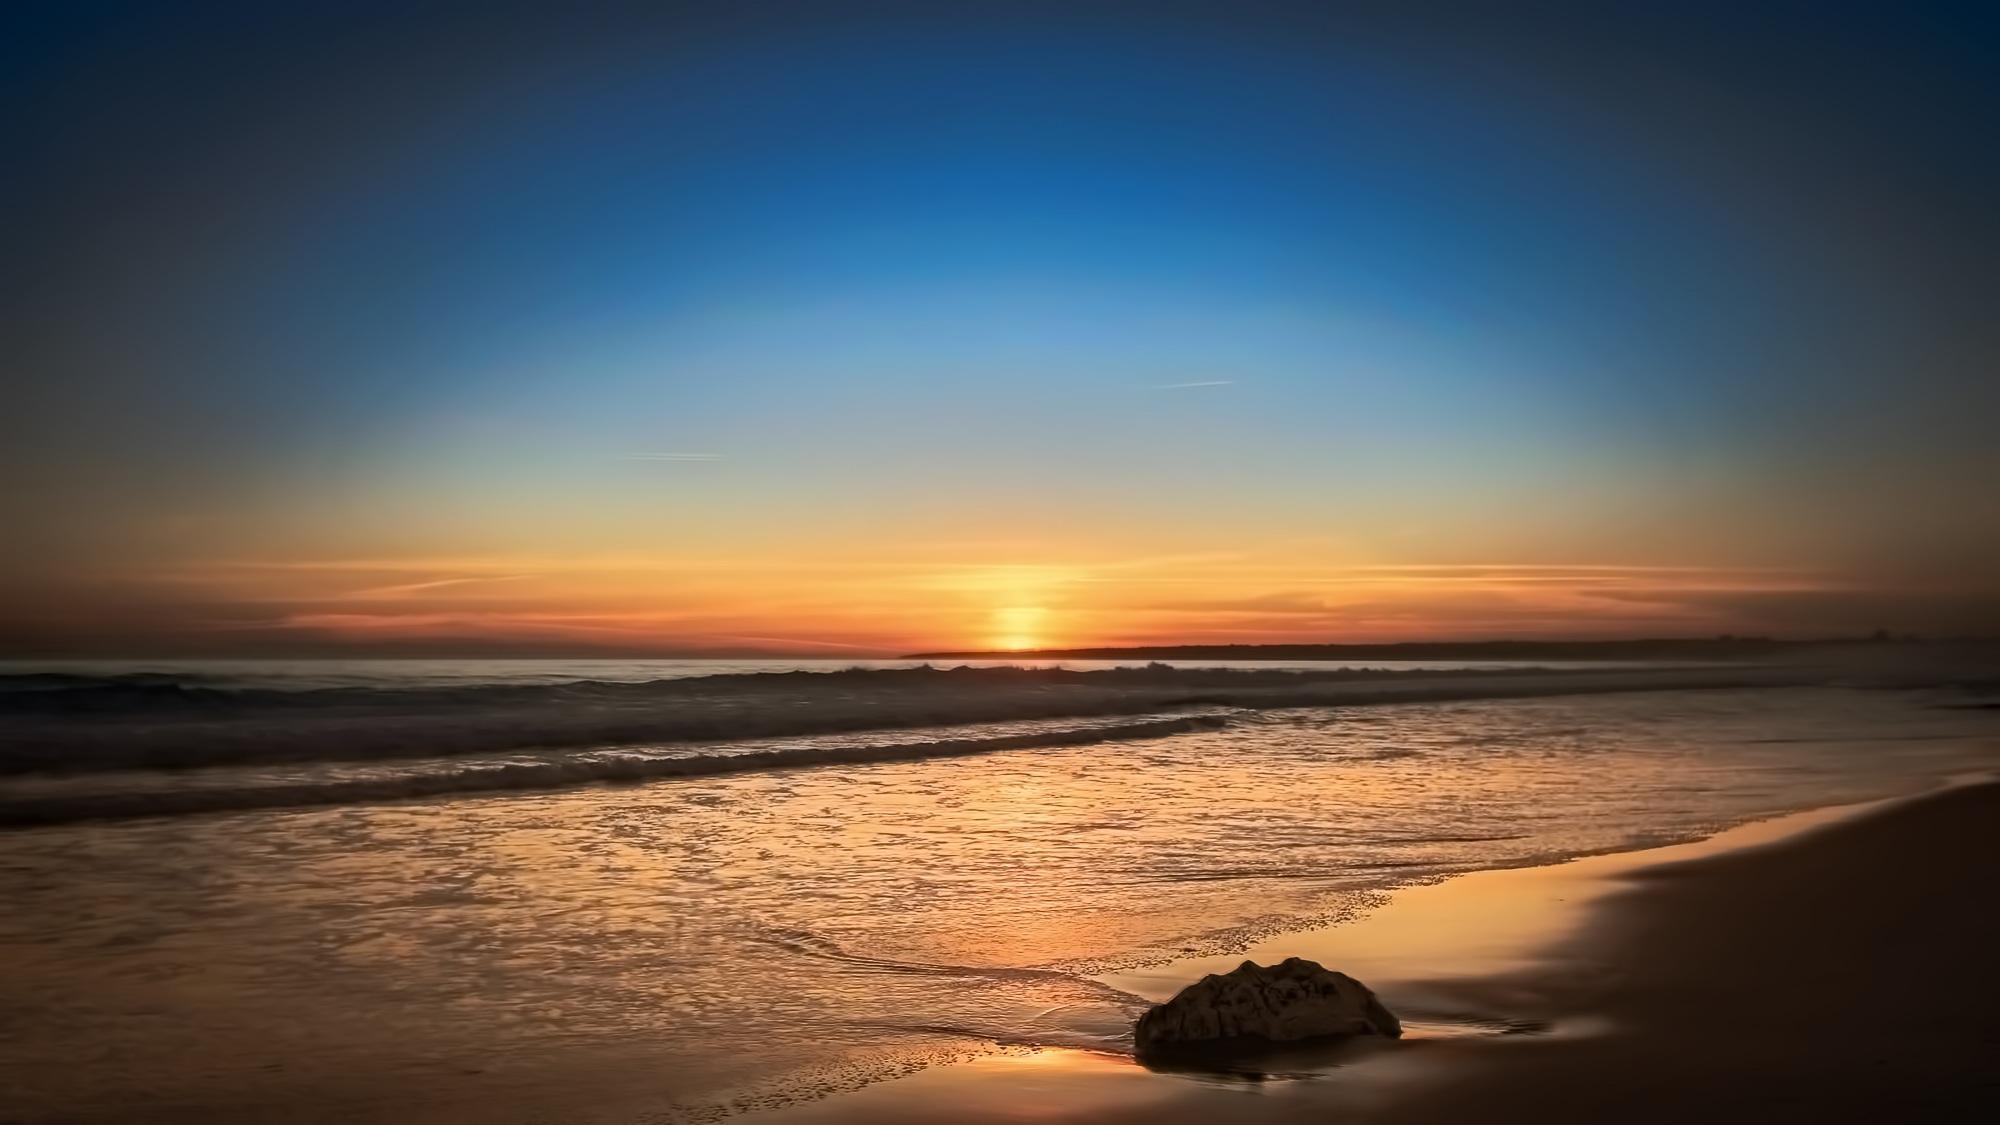 sunset-2551379.jpg